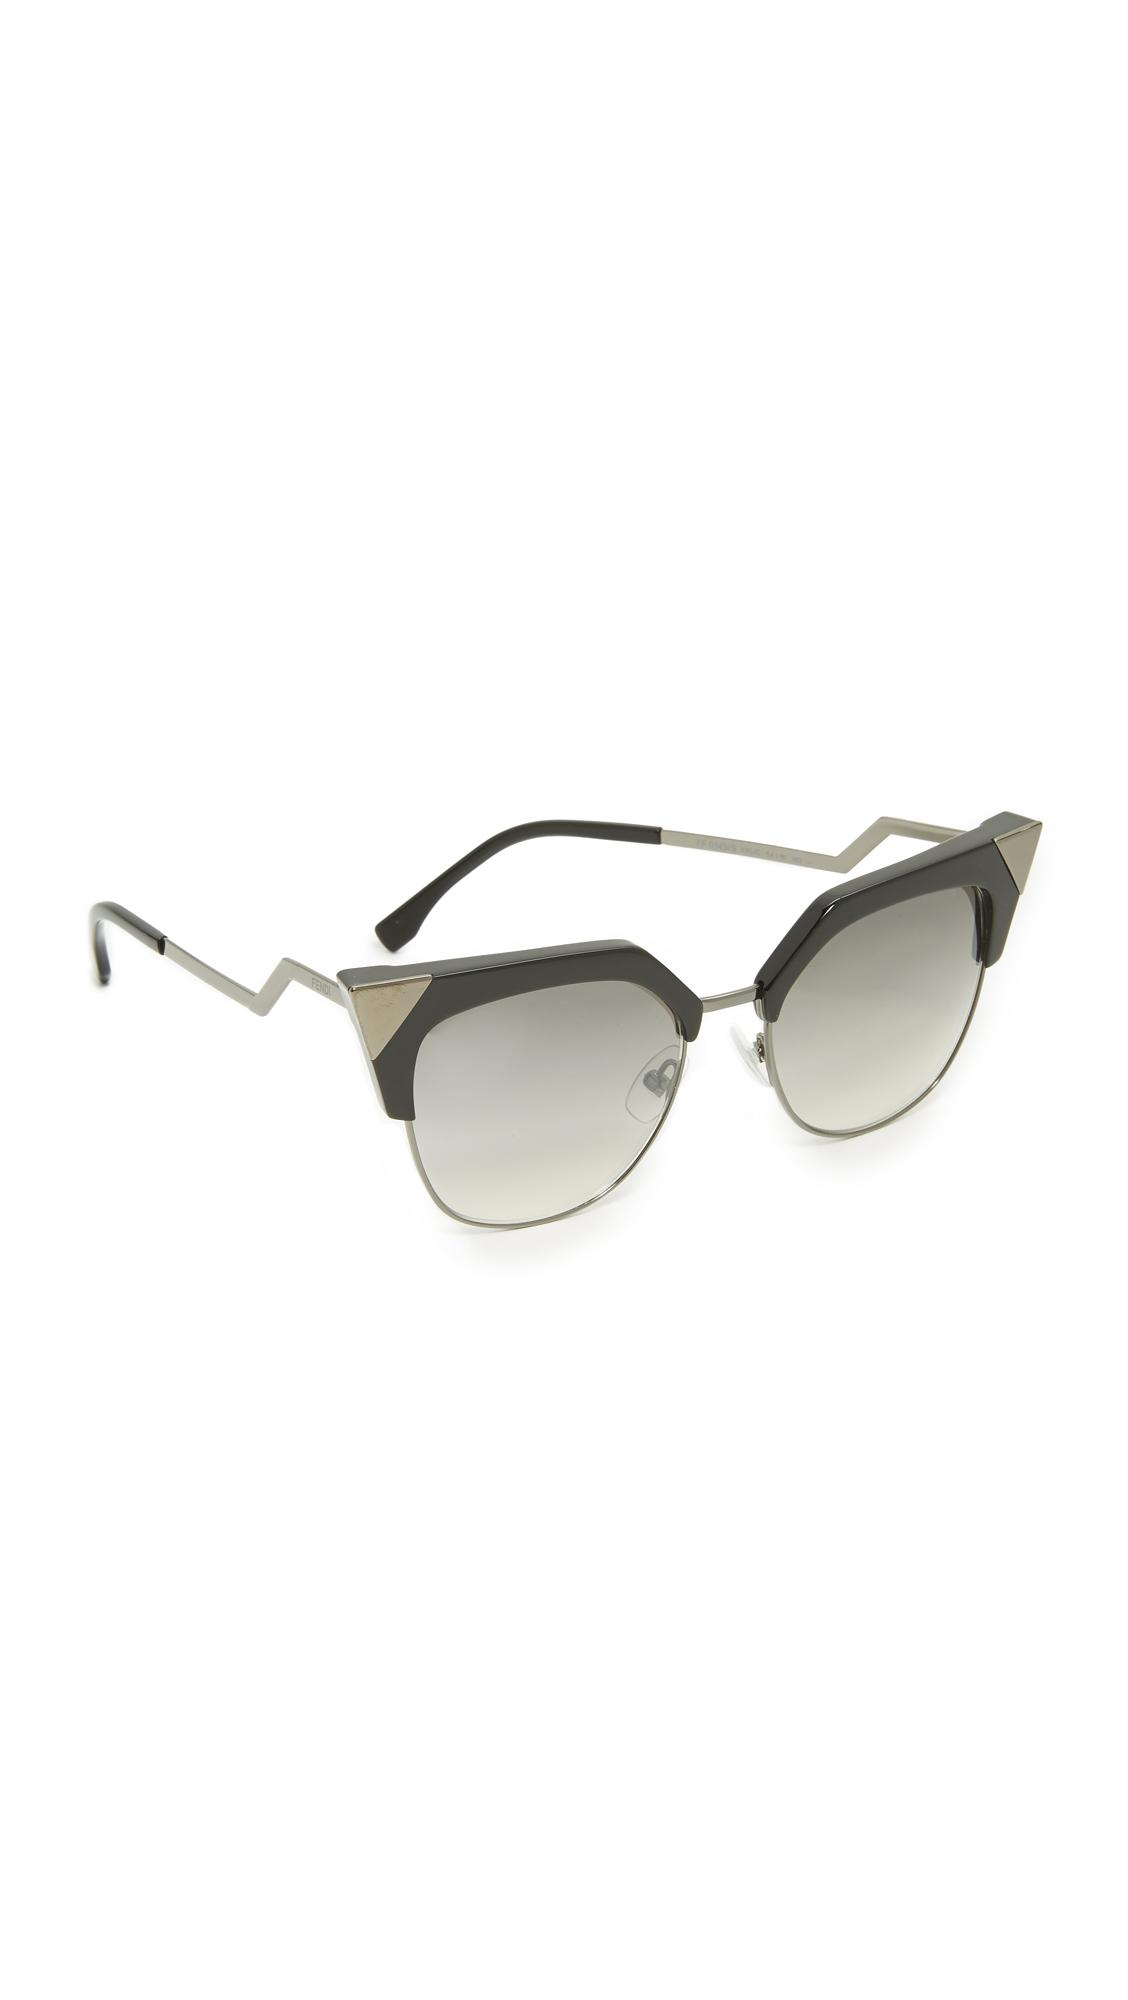 05e3600b9b70 Lyst - Fendi Iridia Crystal Corner Sunglasses in Gray